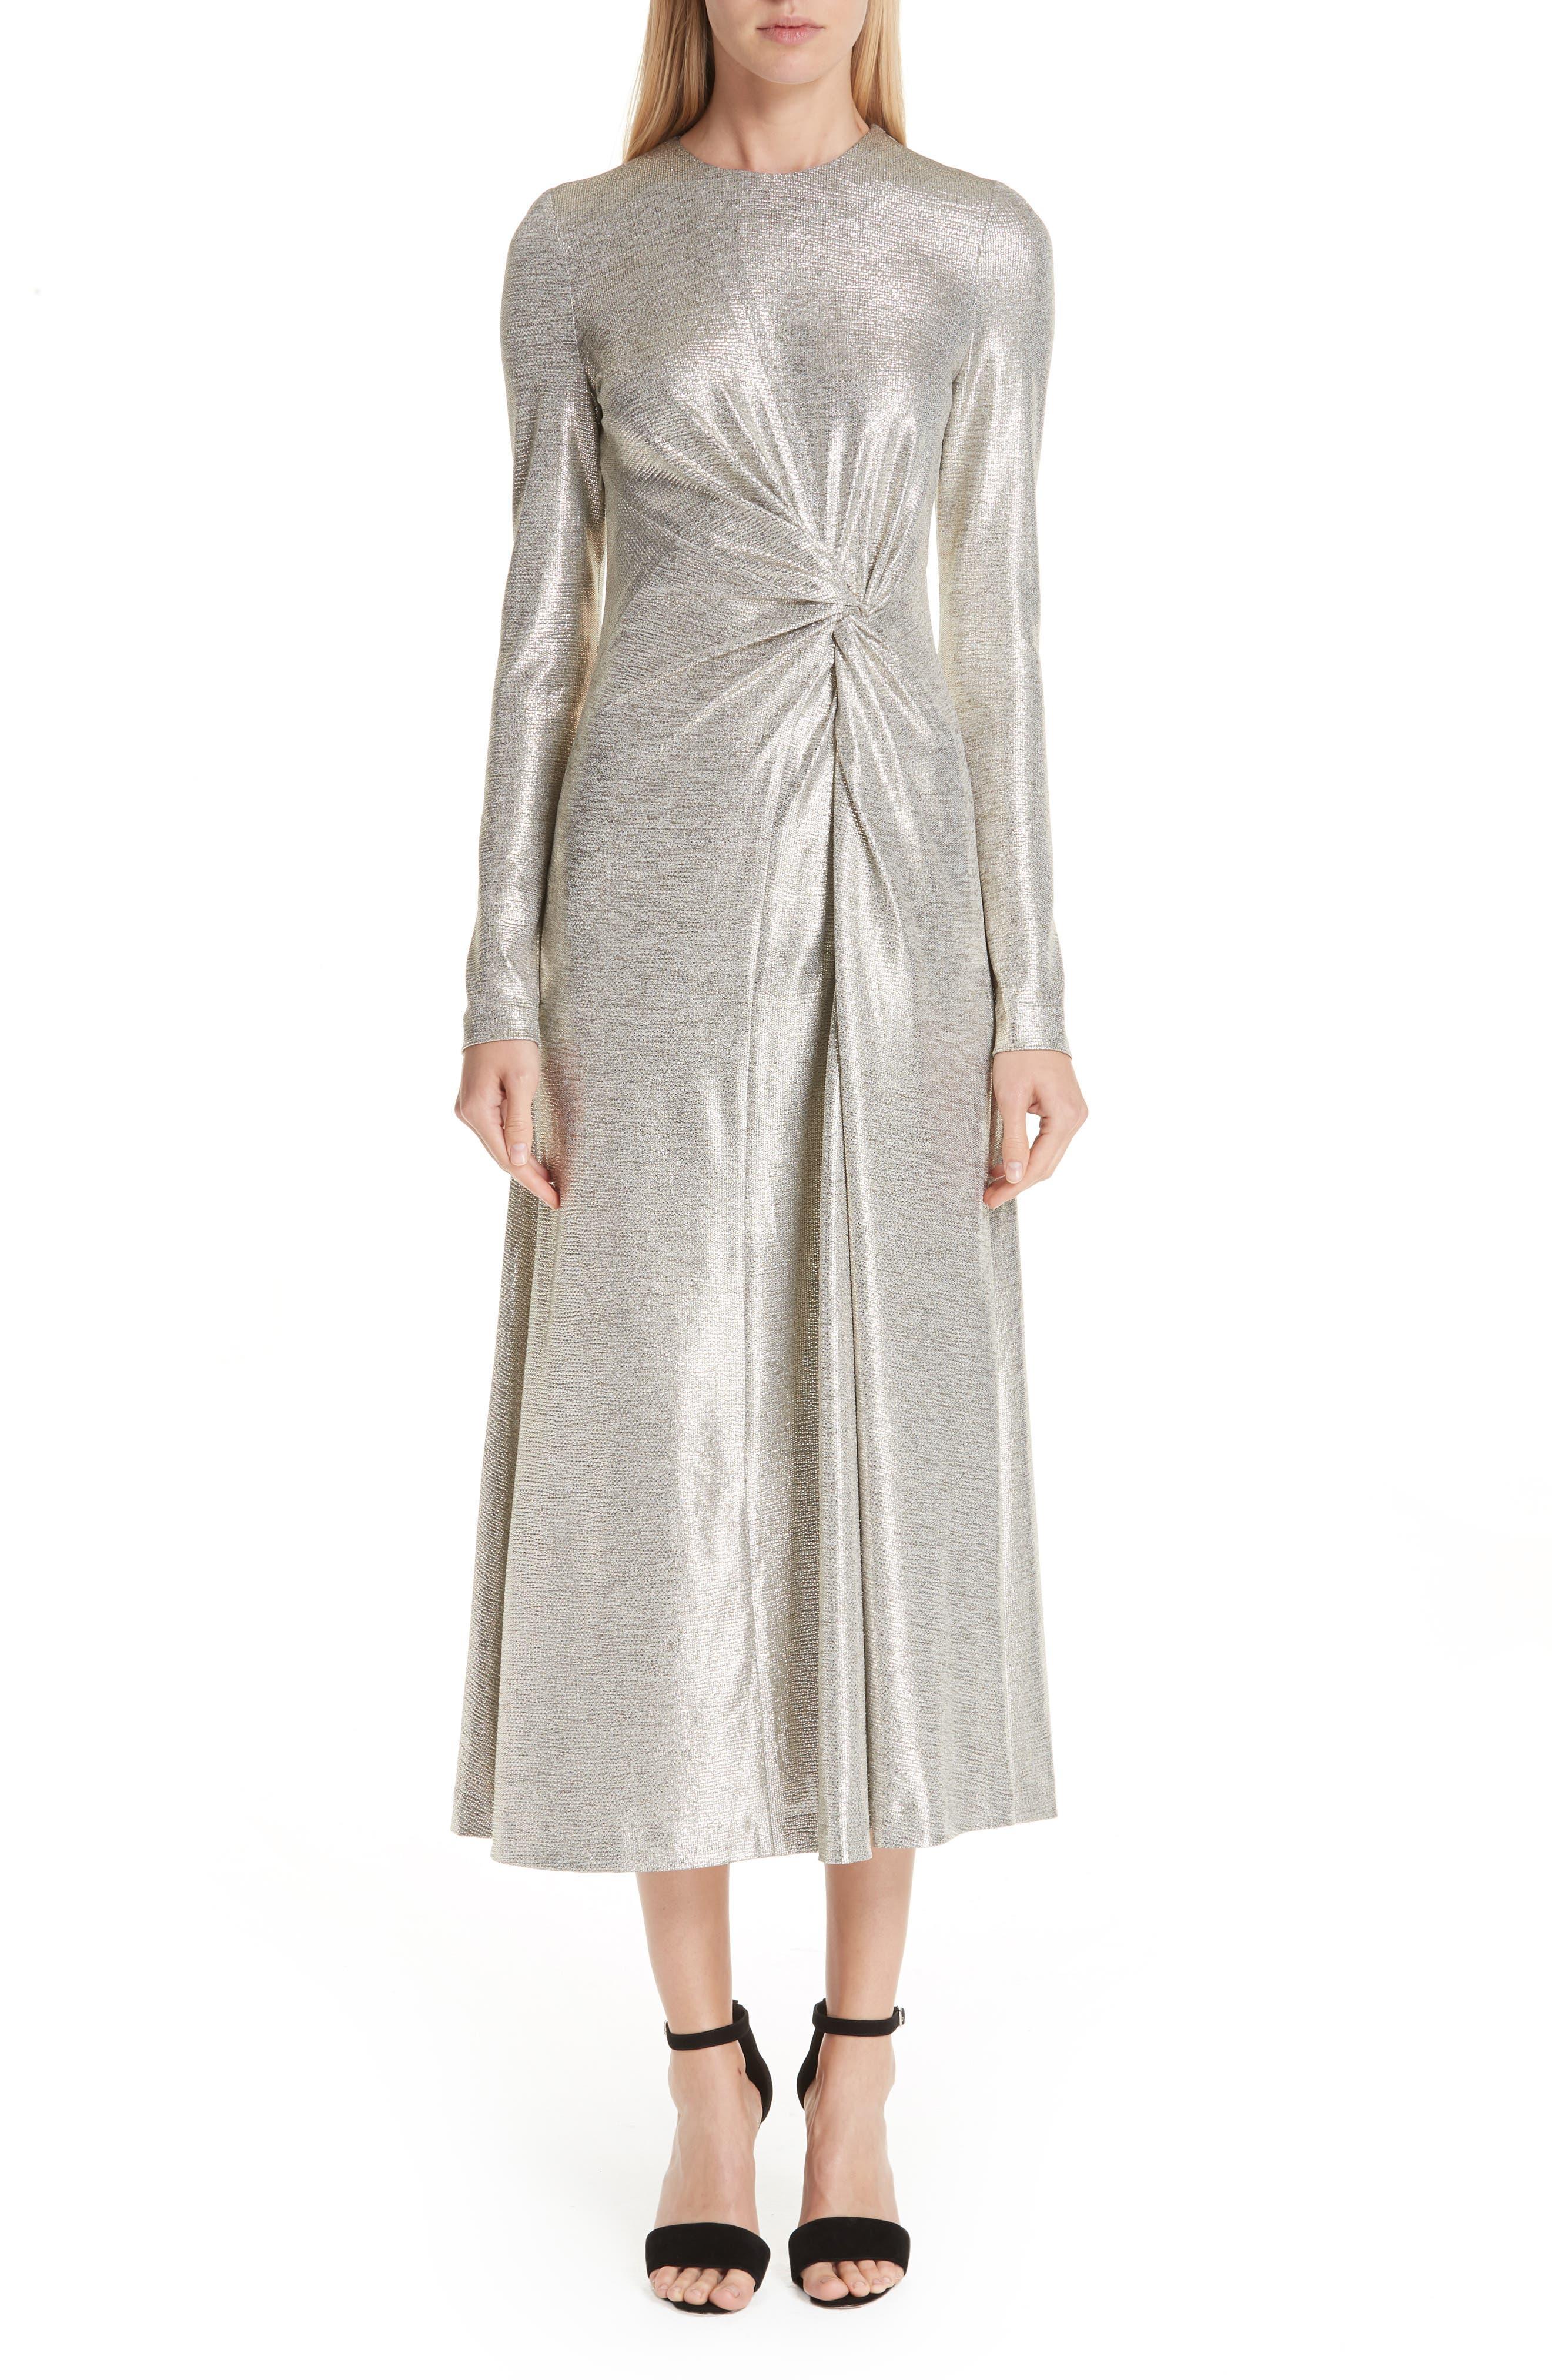 Twist Detail Metallic Dress, Main, color, PLATINUM